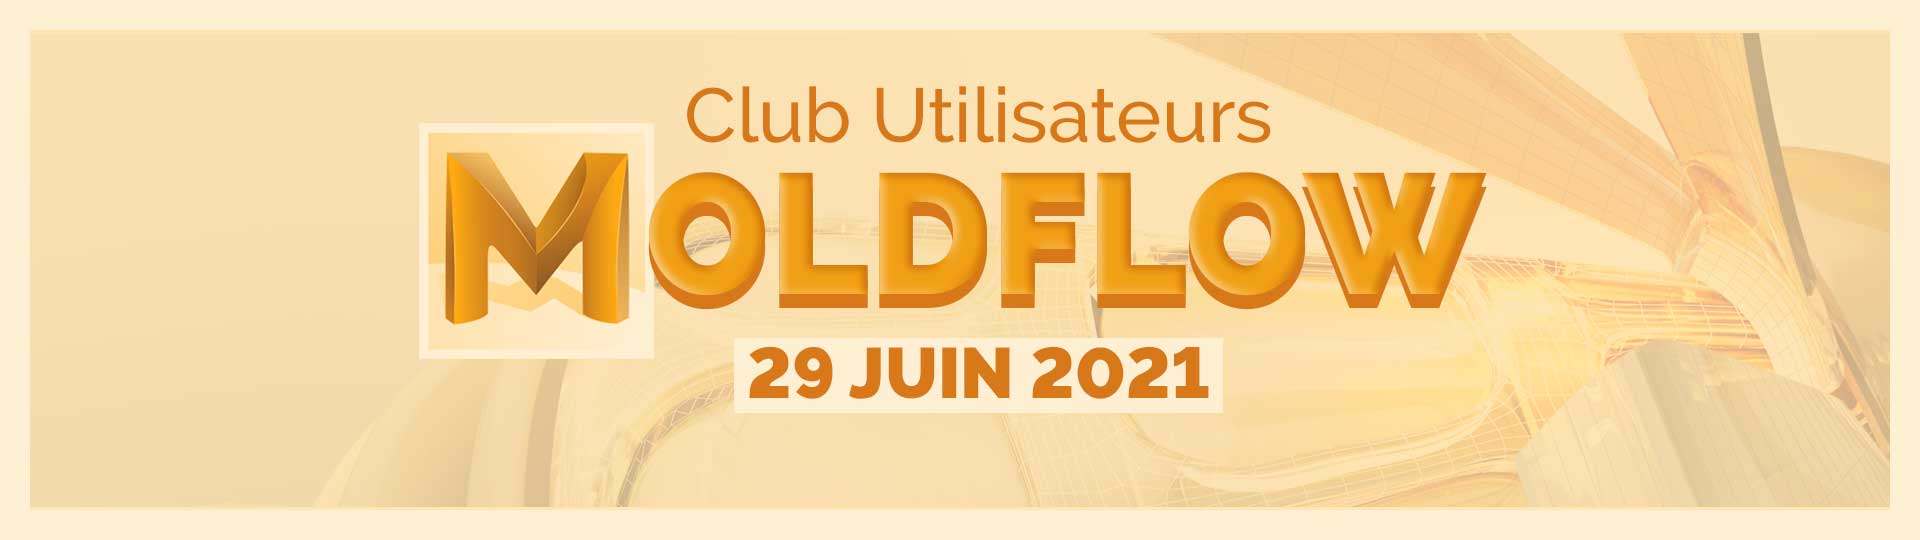 club utilisateurs moldflow 2021